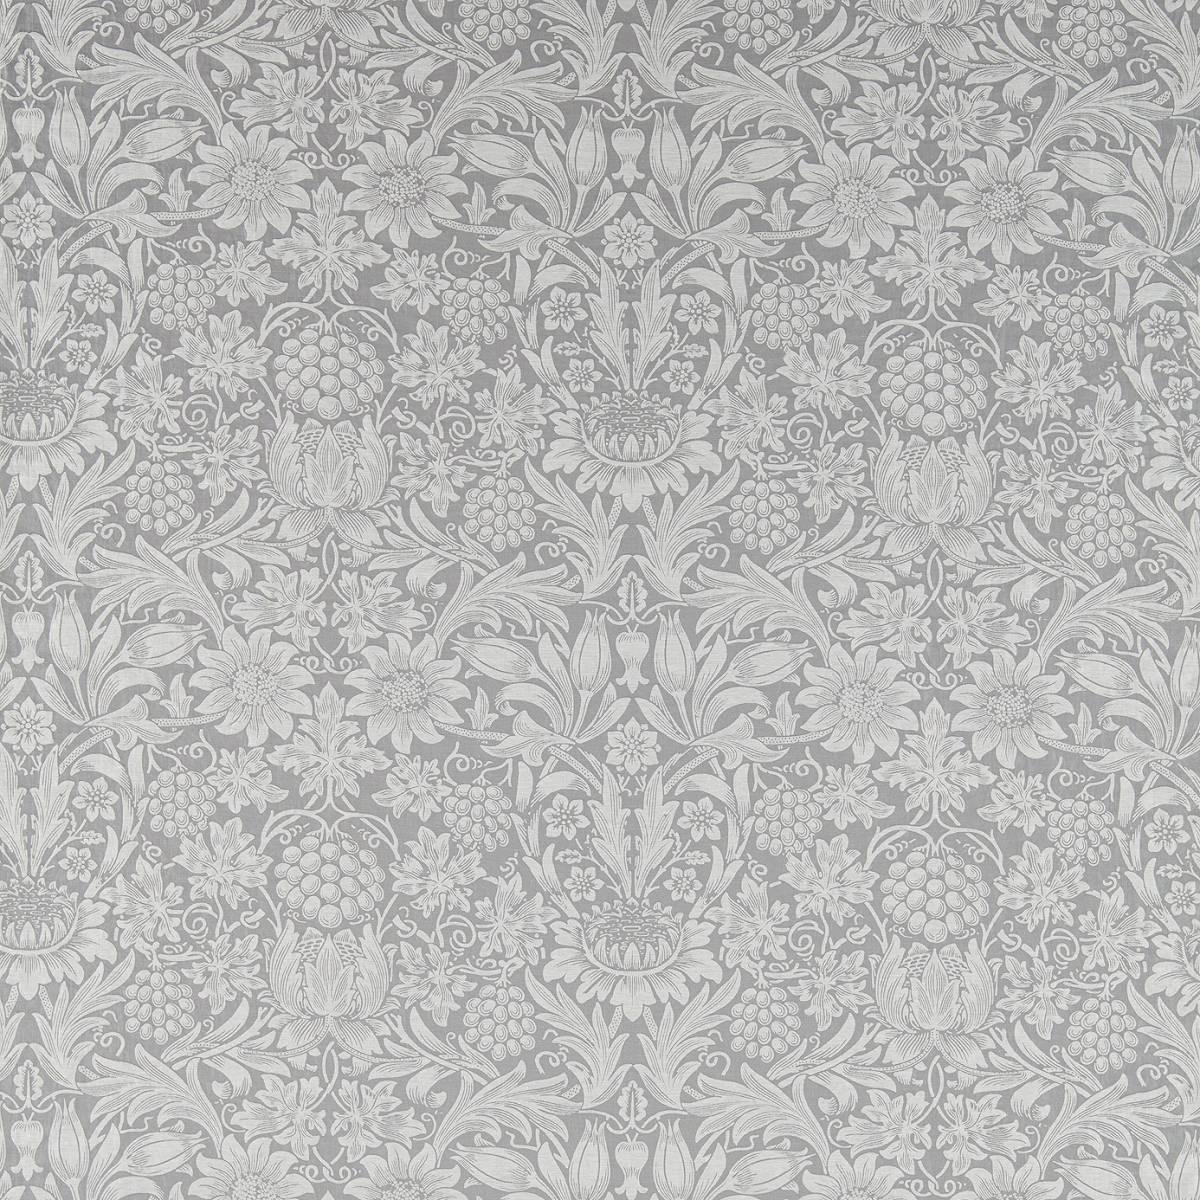 7eaaeb0dfc63 William Morris & Co Pure Morris Fabrics Pure Sunflower Fabric - Dove -  236167. Loading zoom